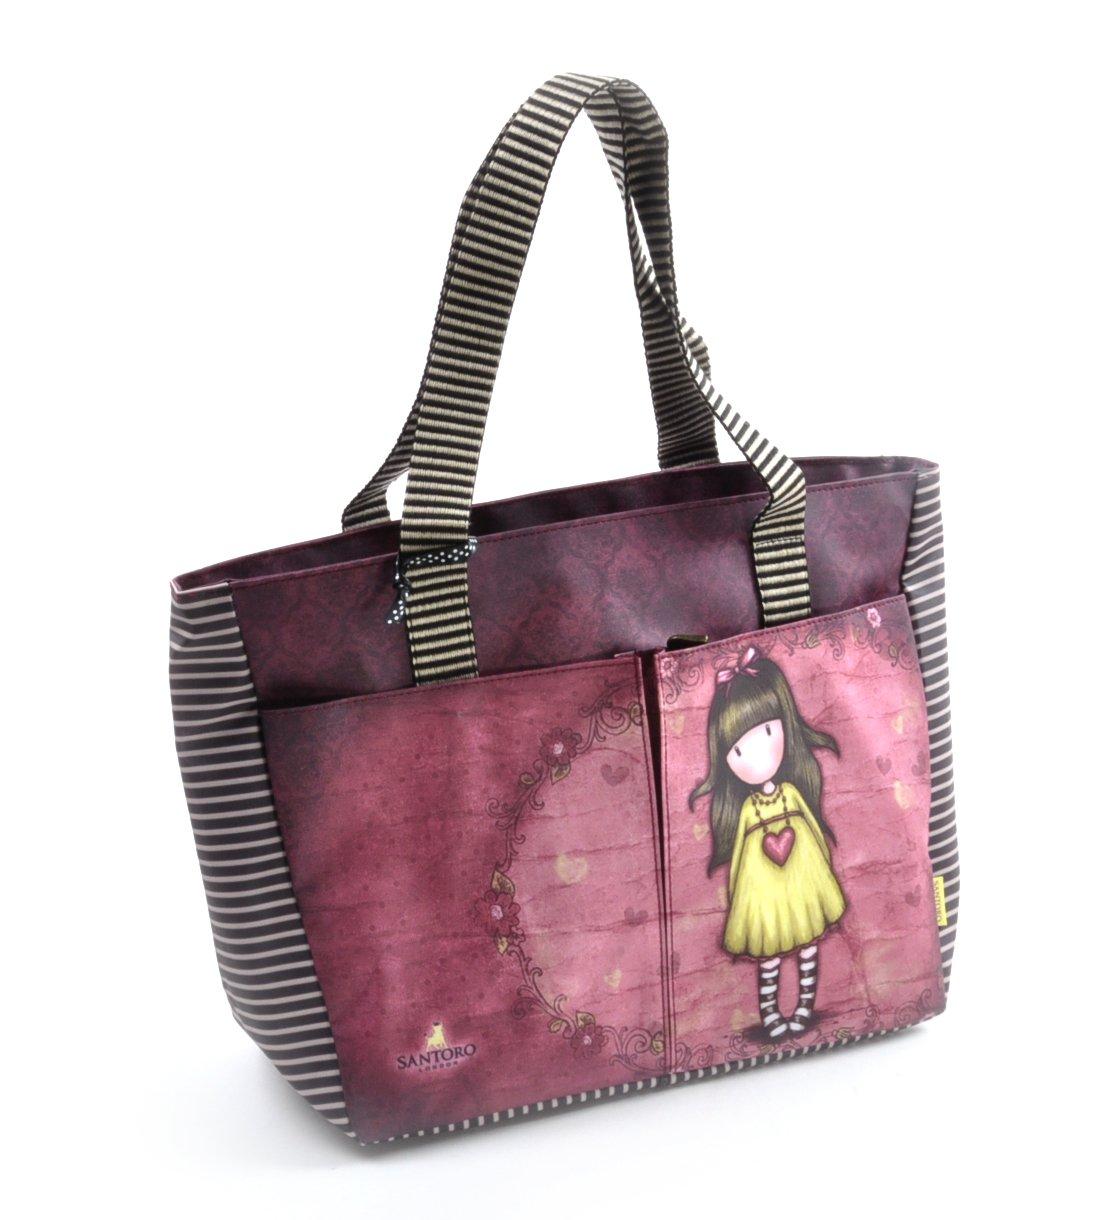 Santoro Gorjuss sac shopper avec poches - cœur 5TXRrauUme